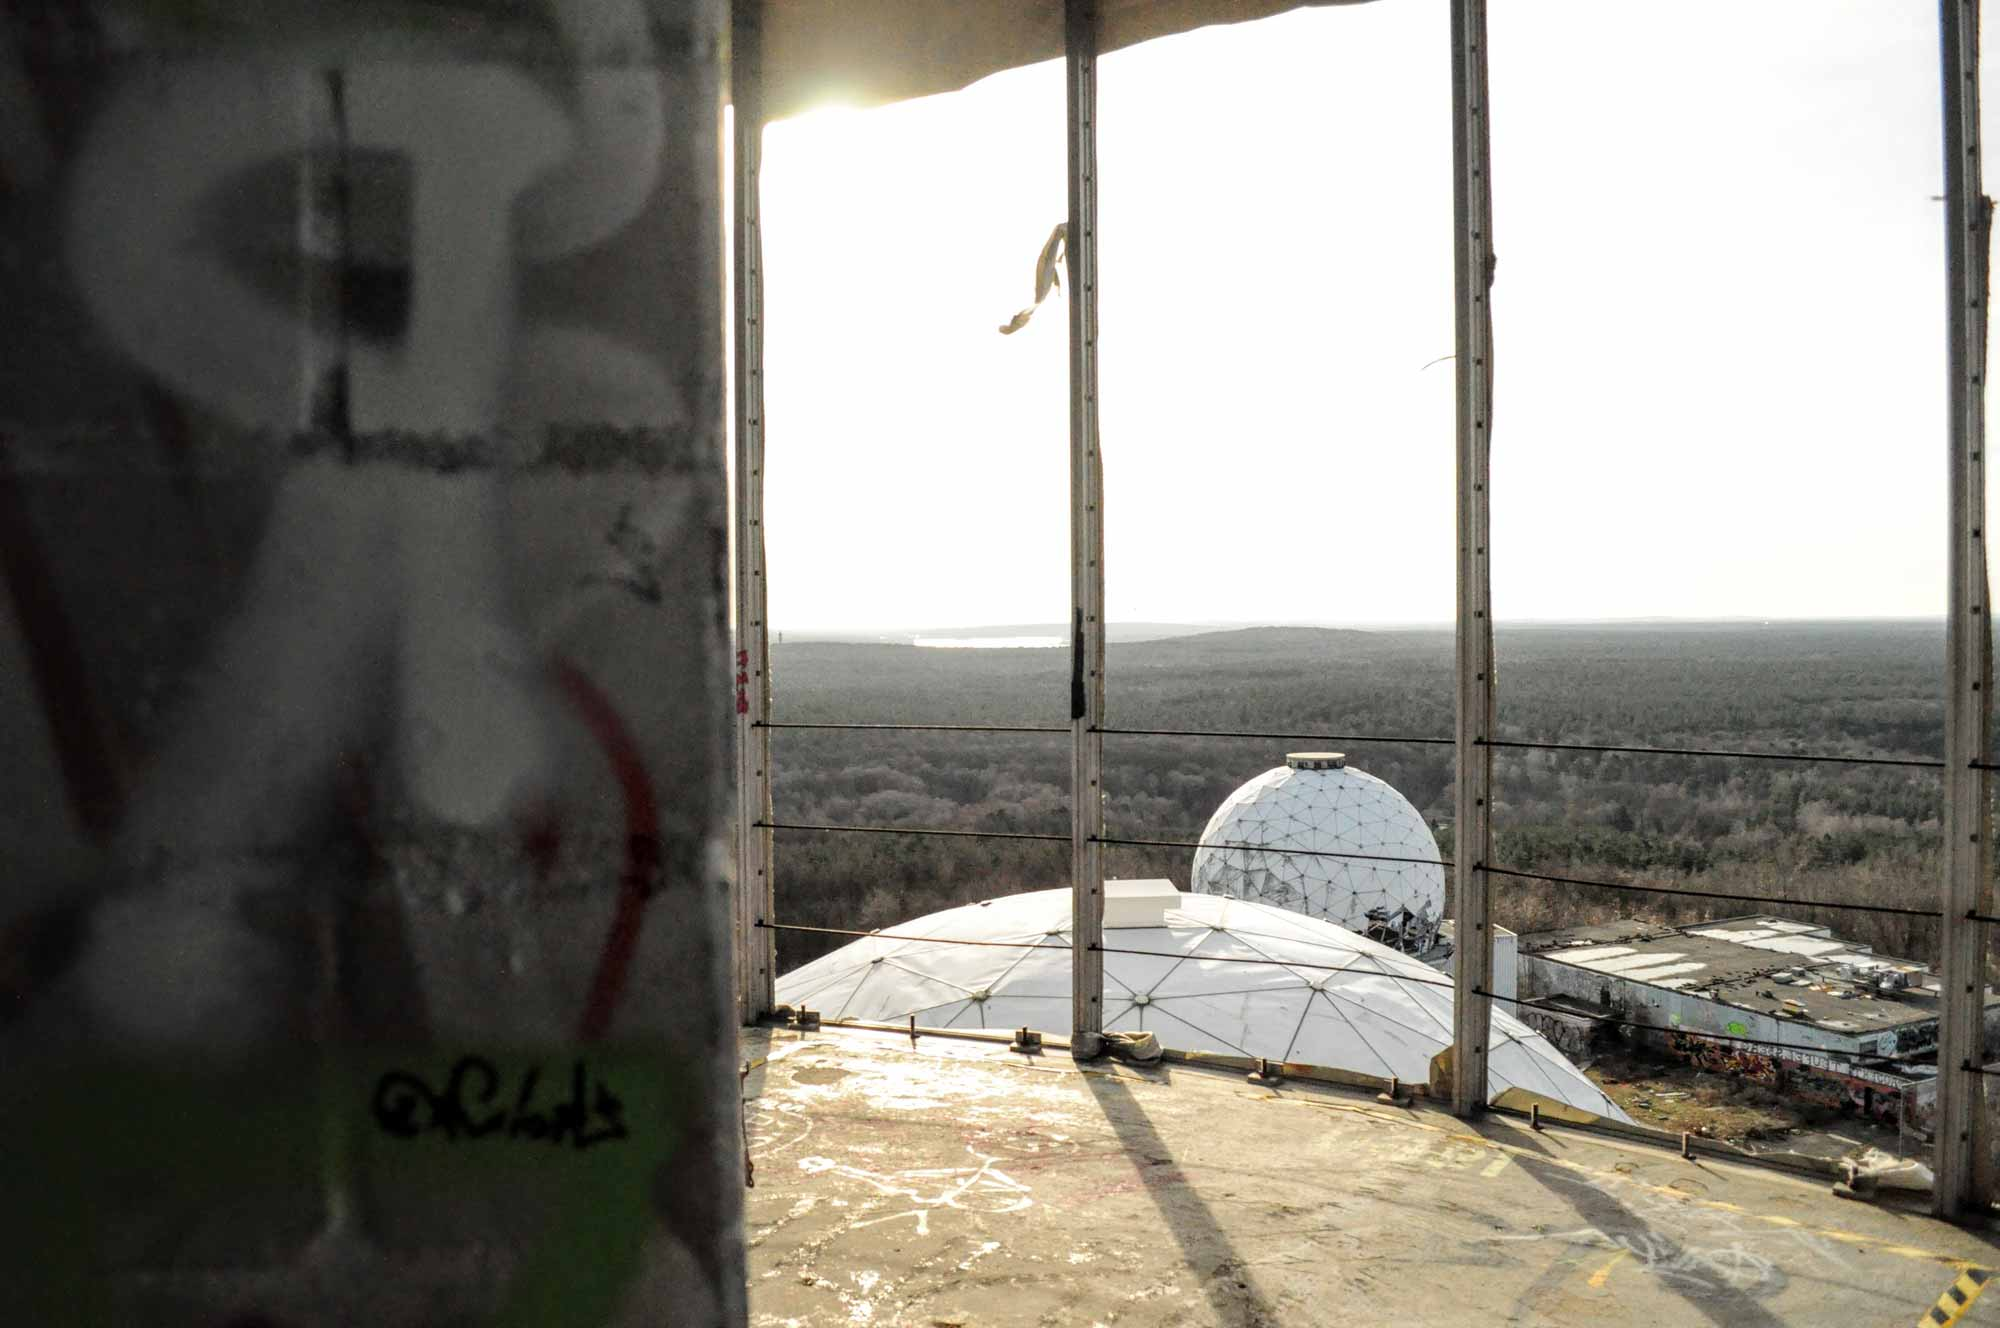 Teufelsberg Berlin - Wandern um die verlassene Abhörstation 2